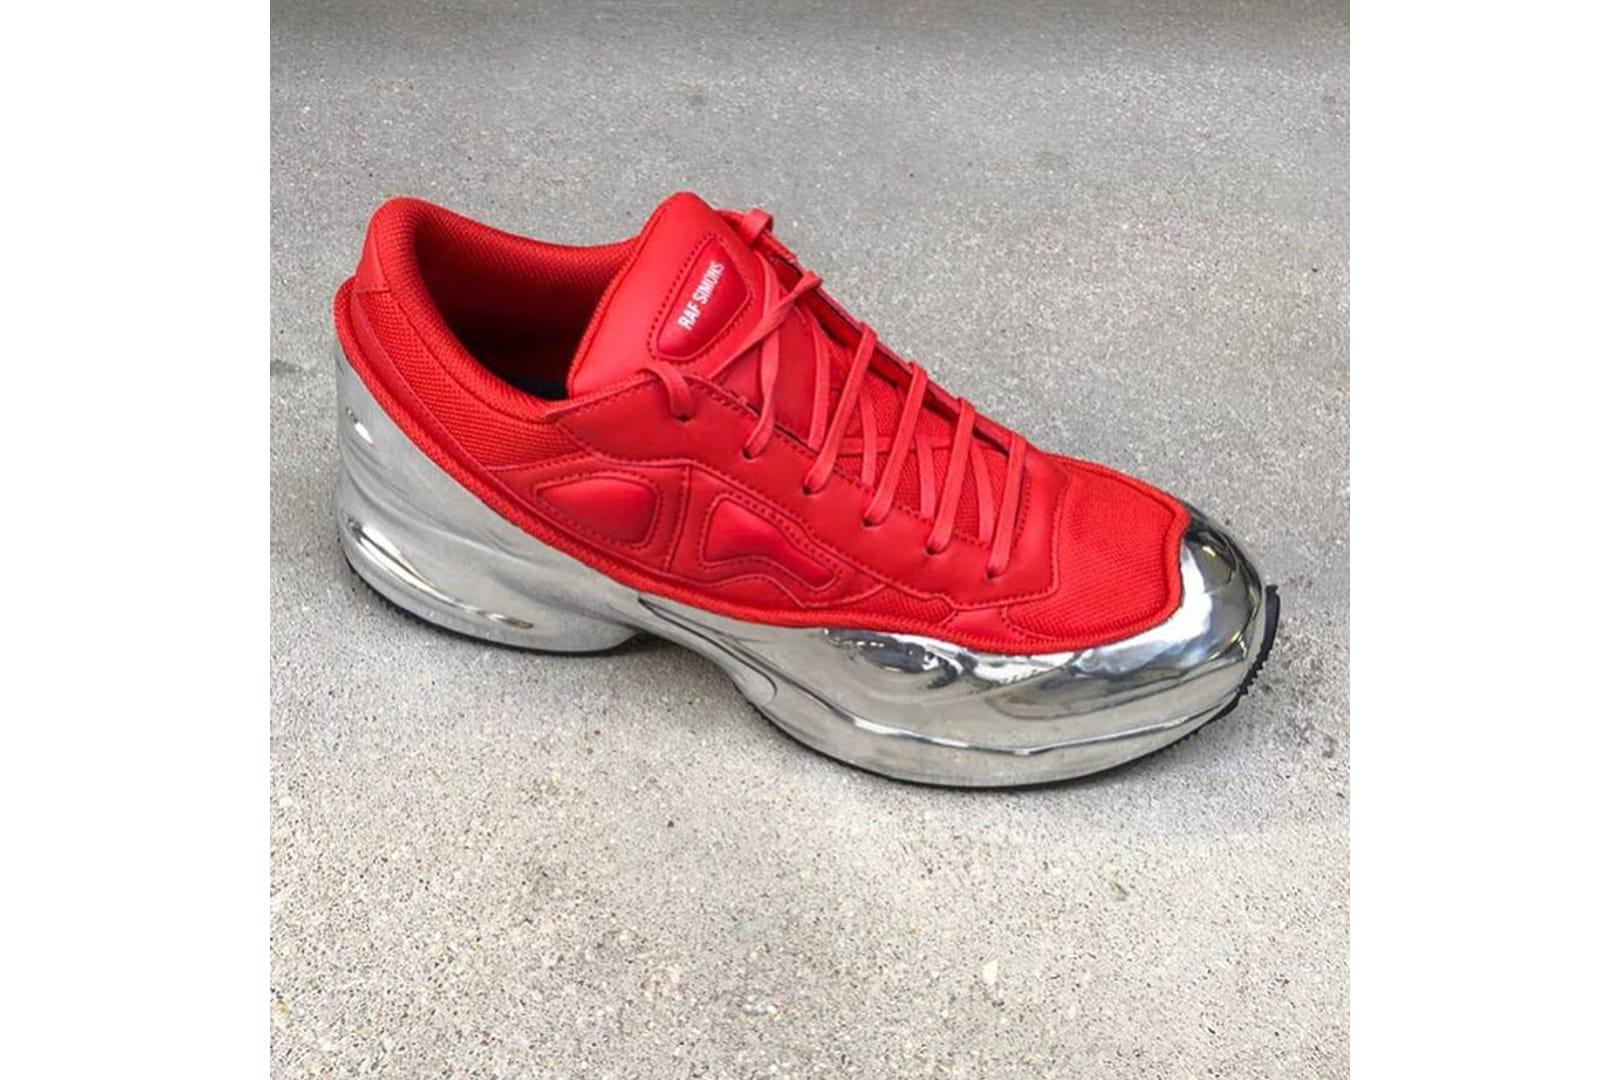 adidas by Raf Simons Ozweegos Spring